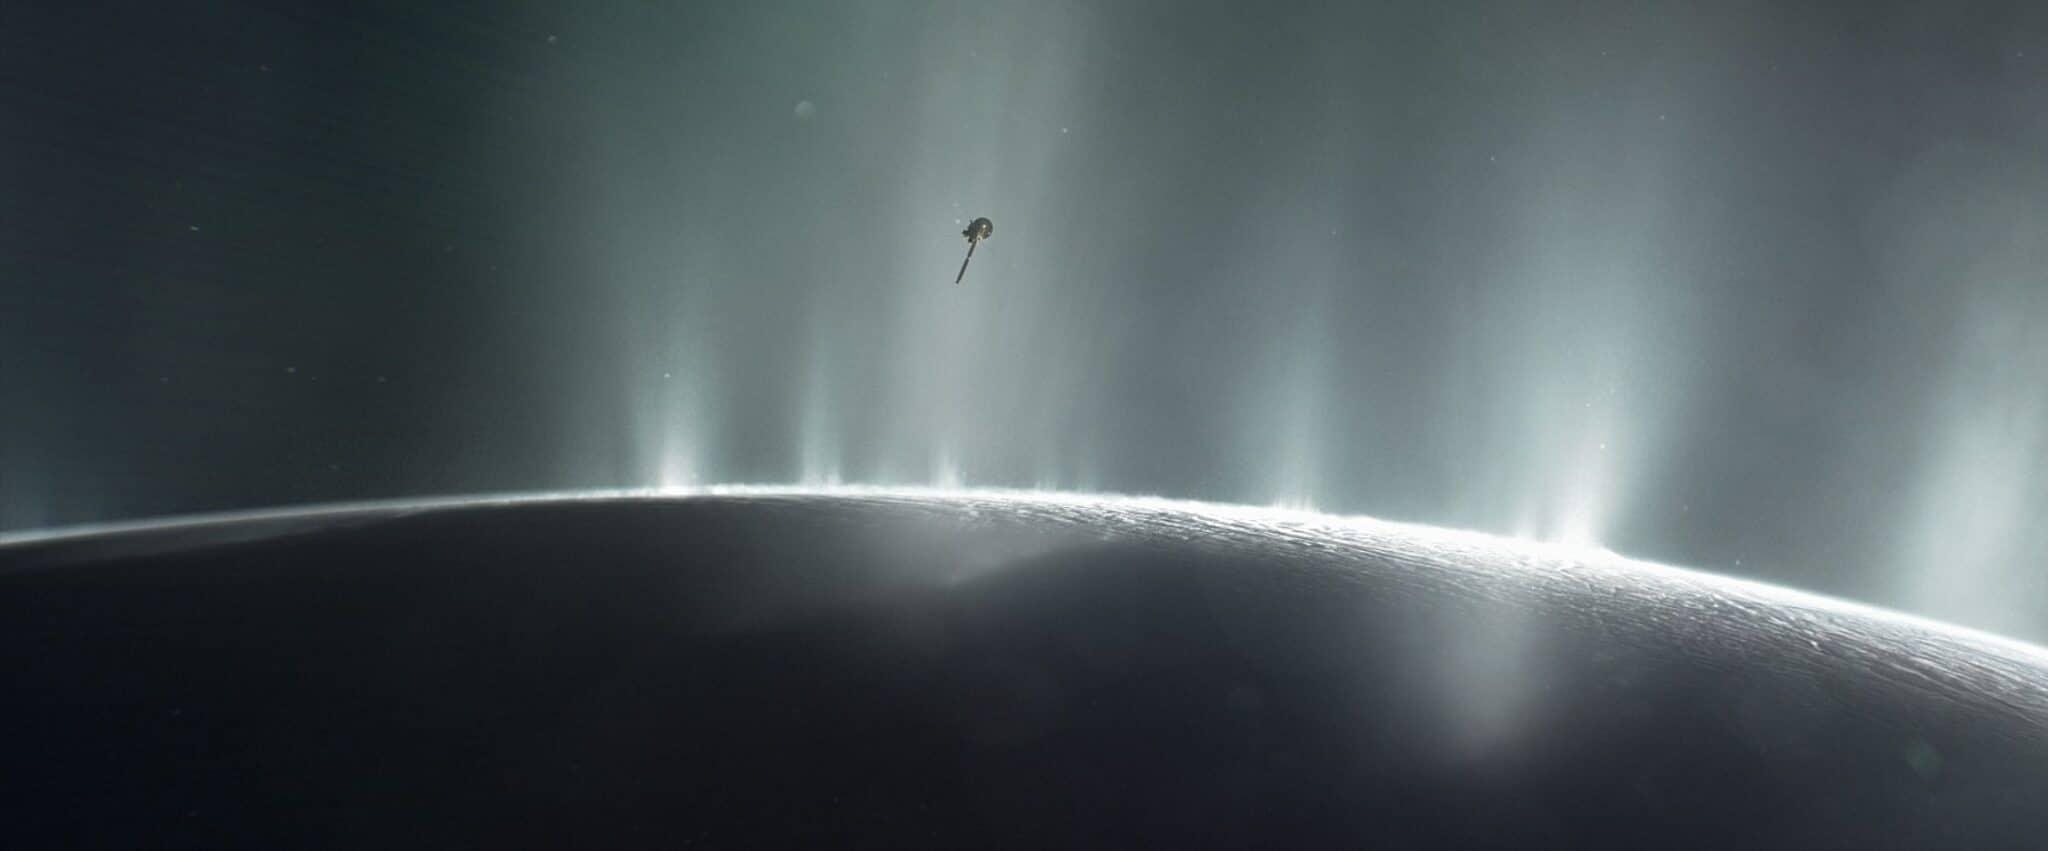 Encelado vita batterica Credits: NASA